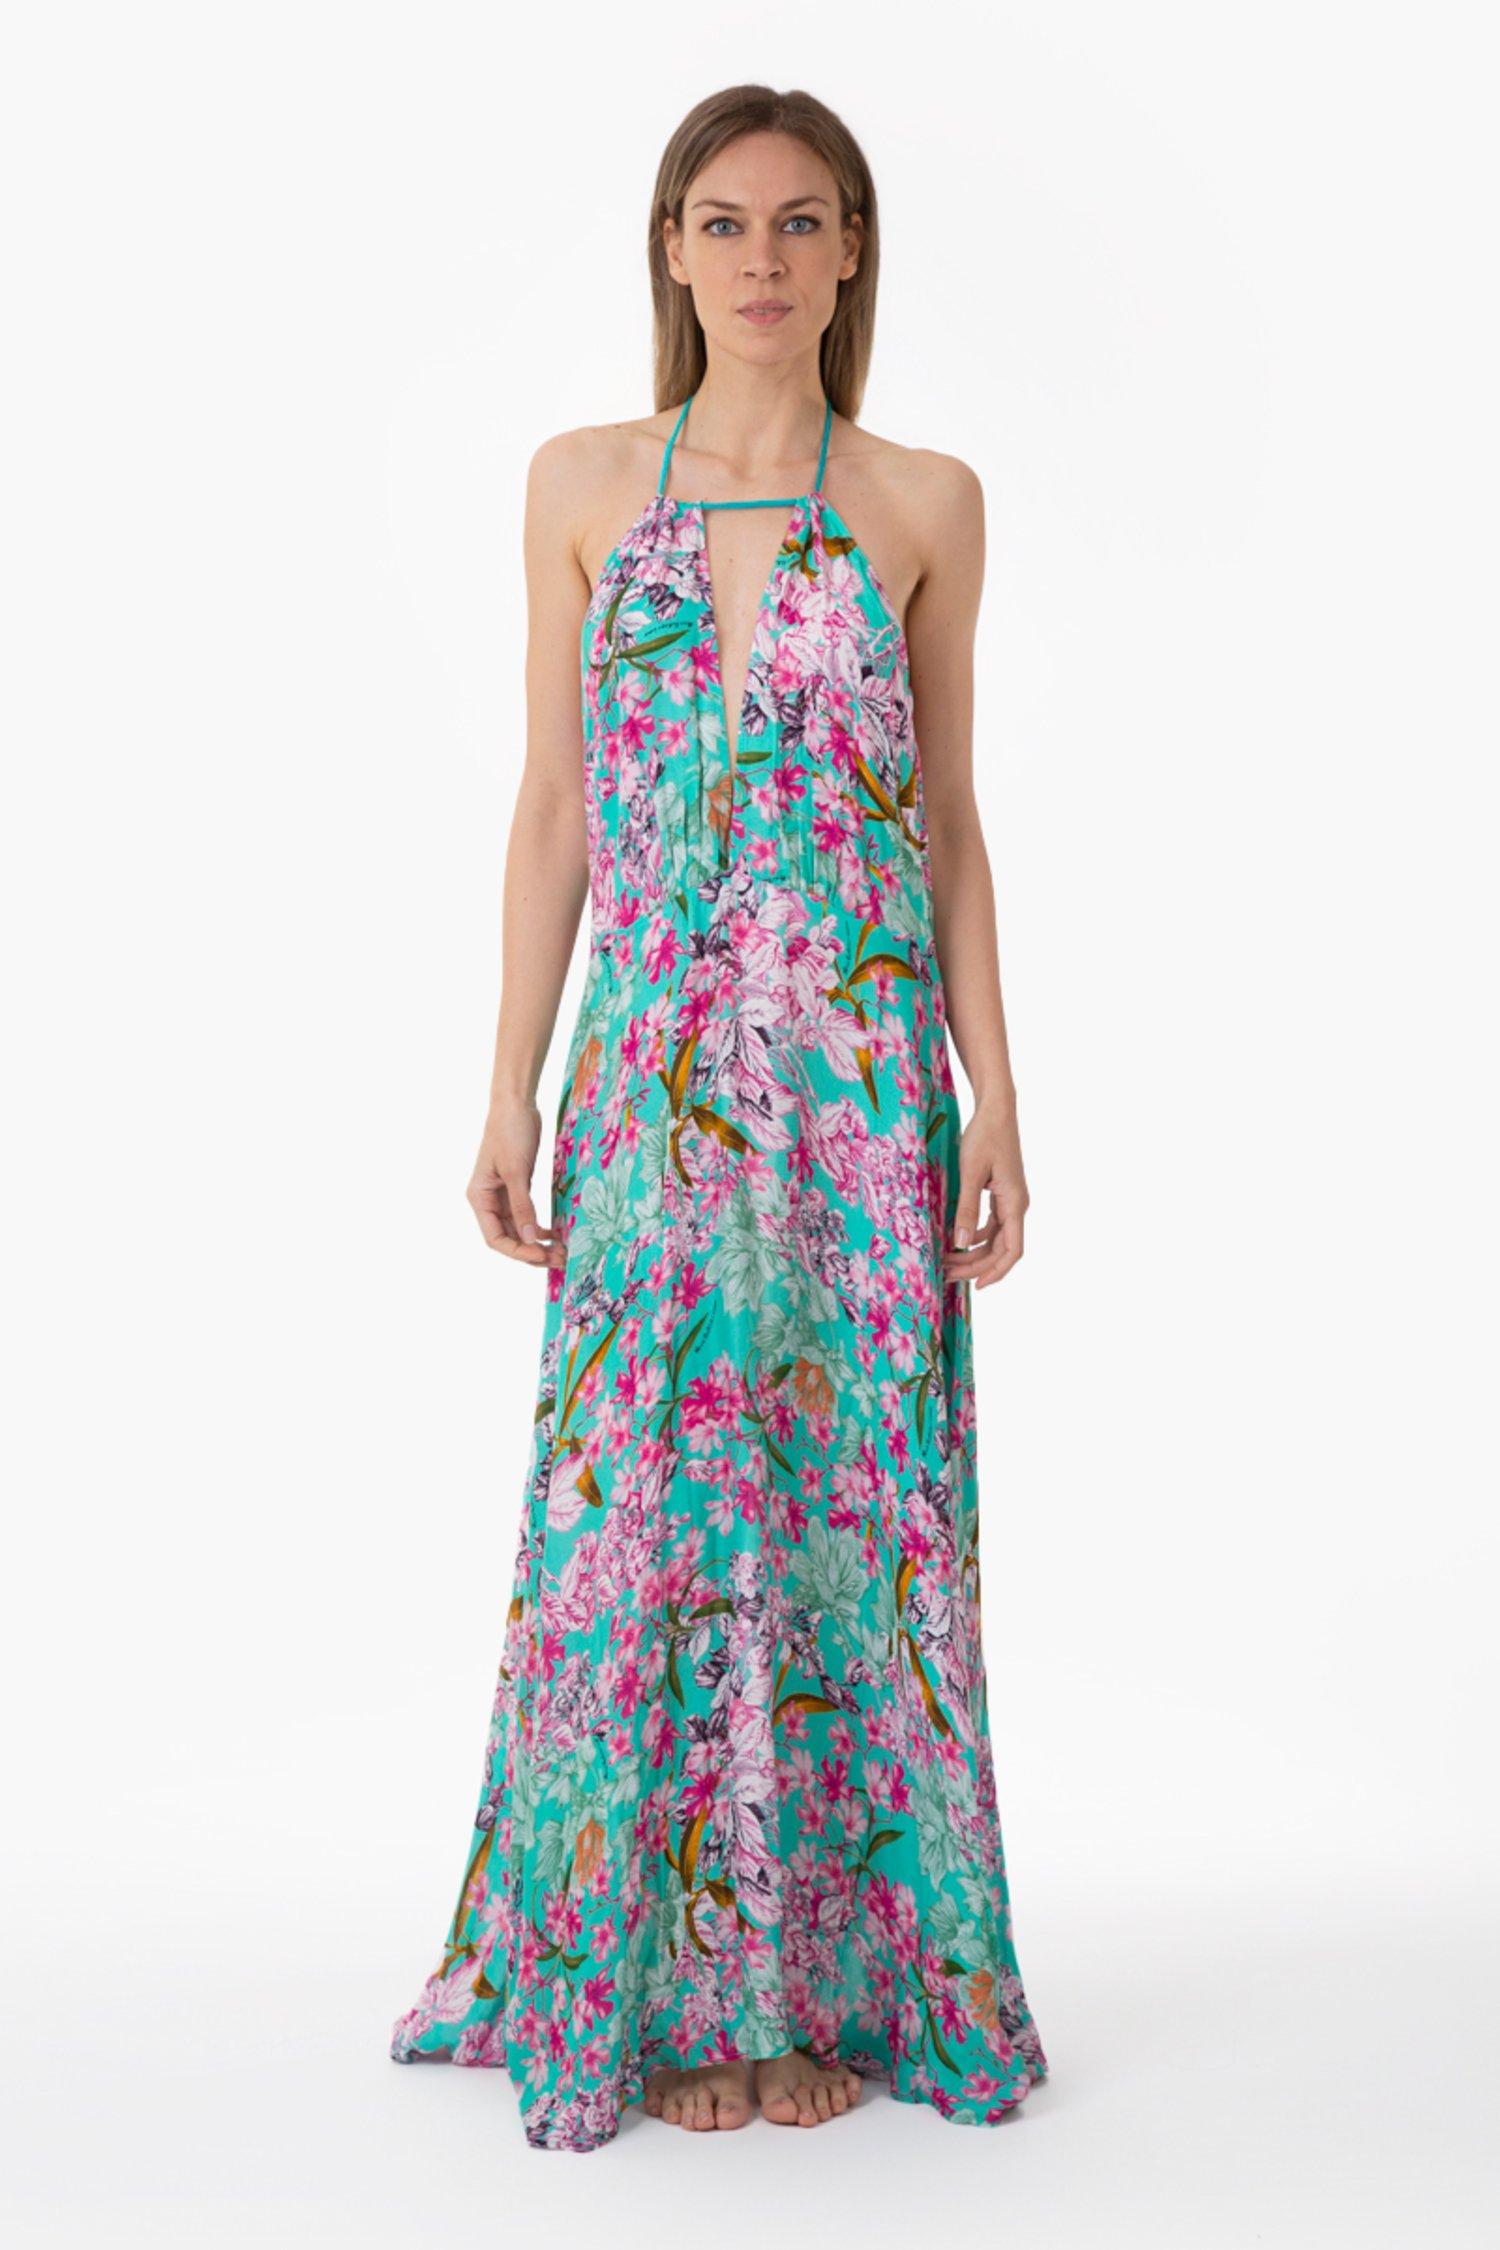 LUXE PRINTED LONG DRESS - Fiori Azzurro